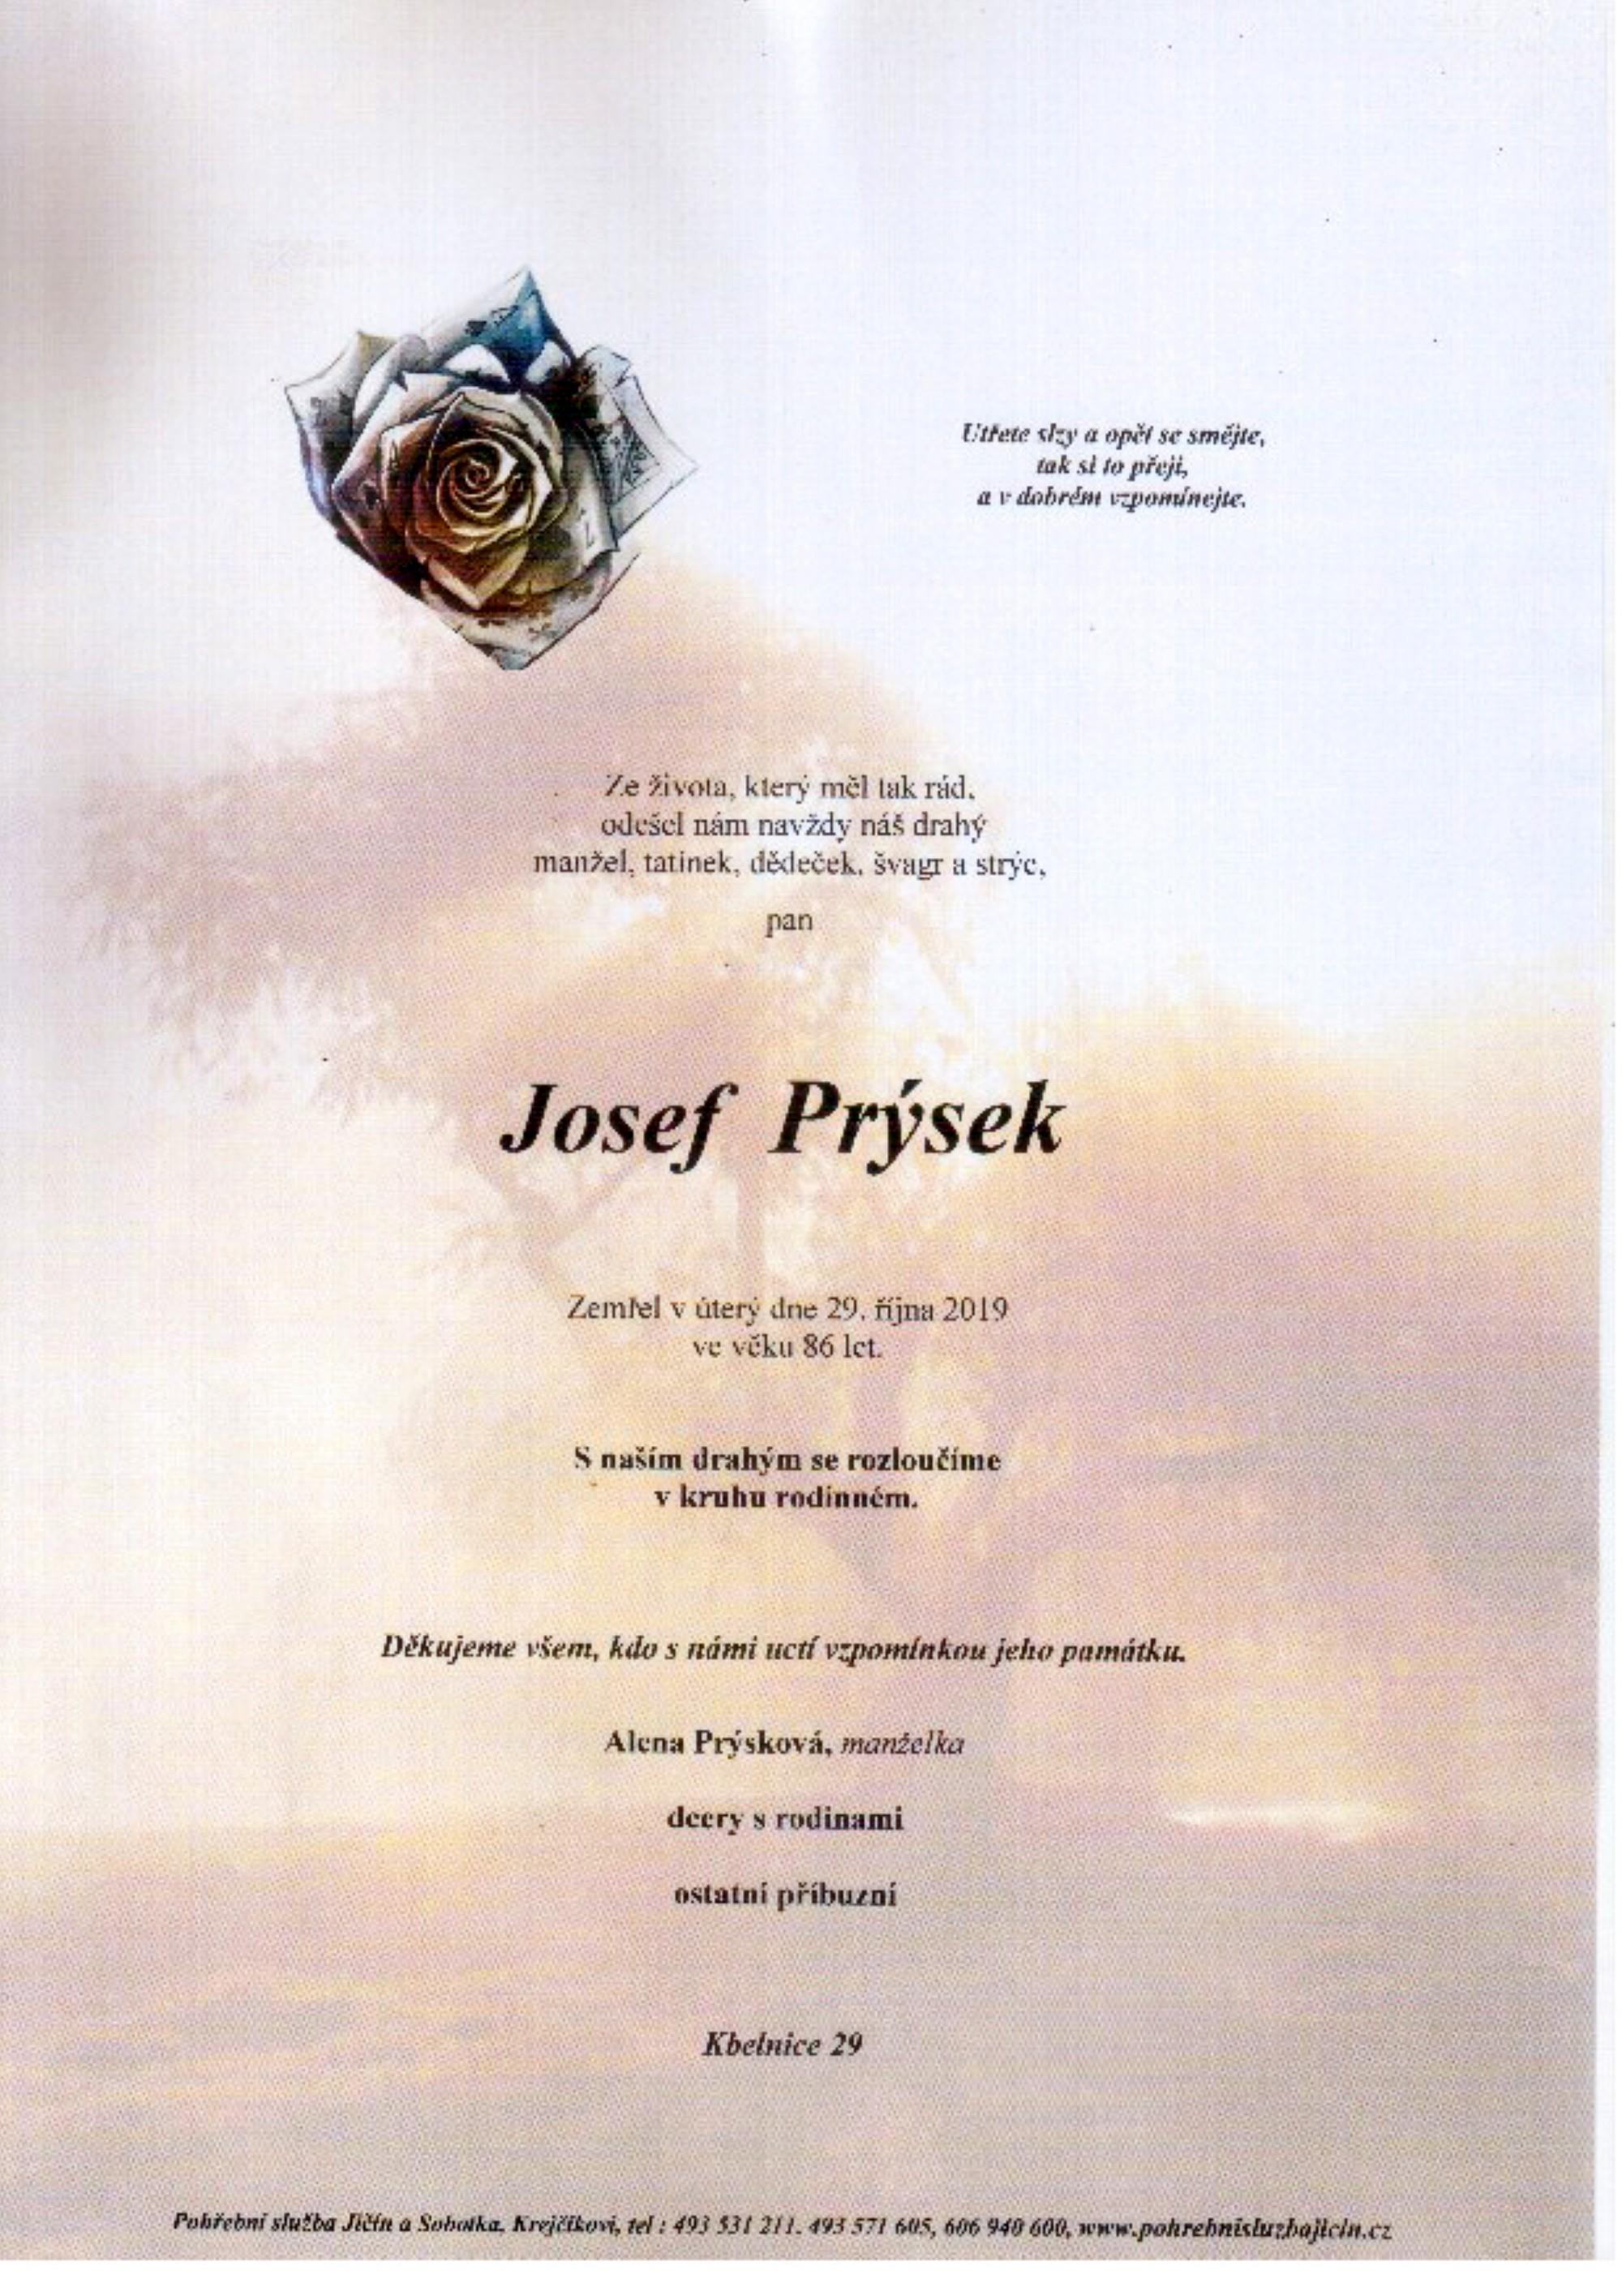 Josef Prýsek